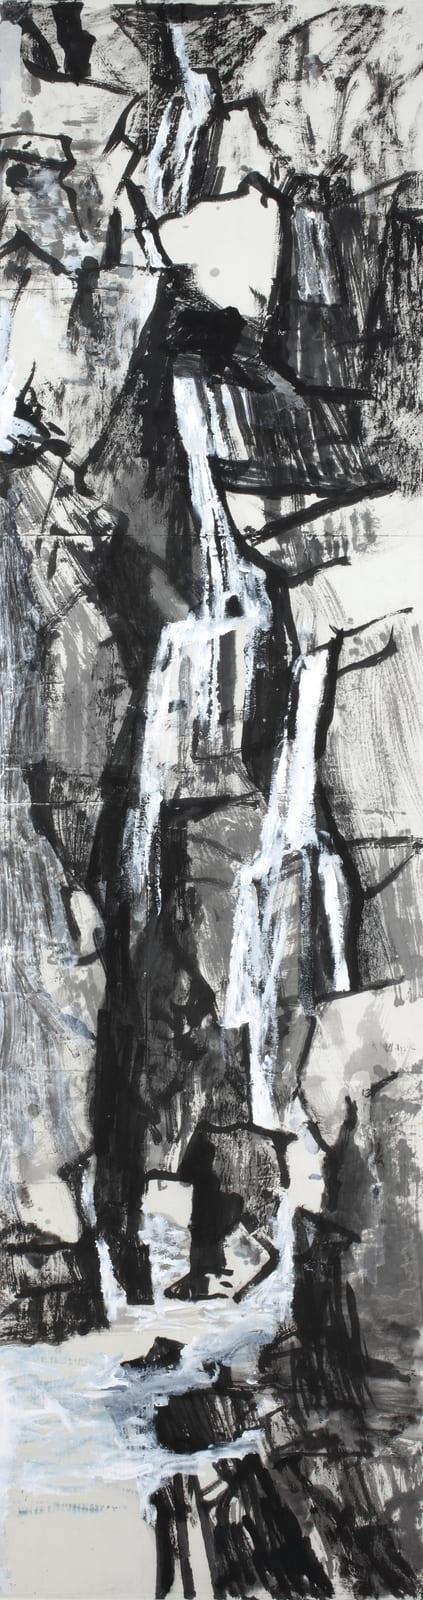 Wang Gongyi 王公懿, Landscape - Water, Rocks 水·石, 2018